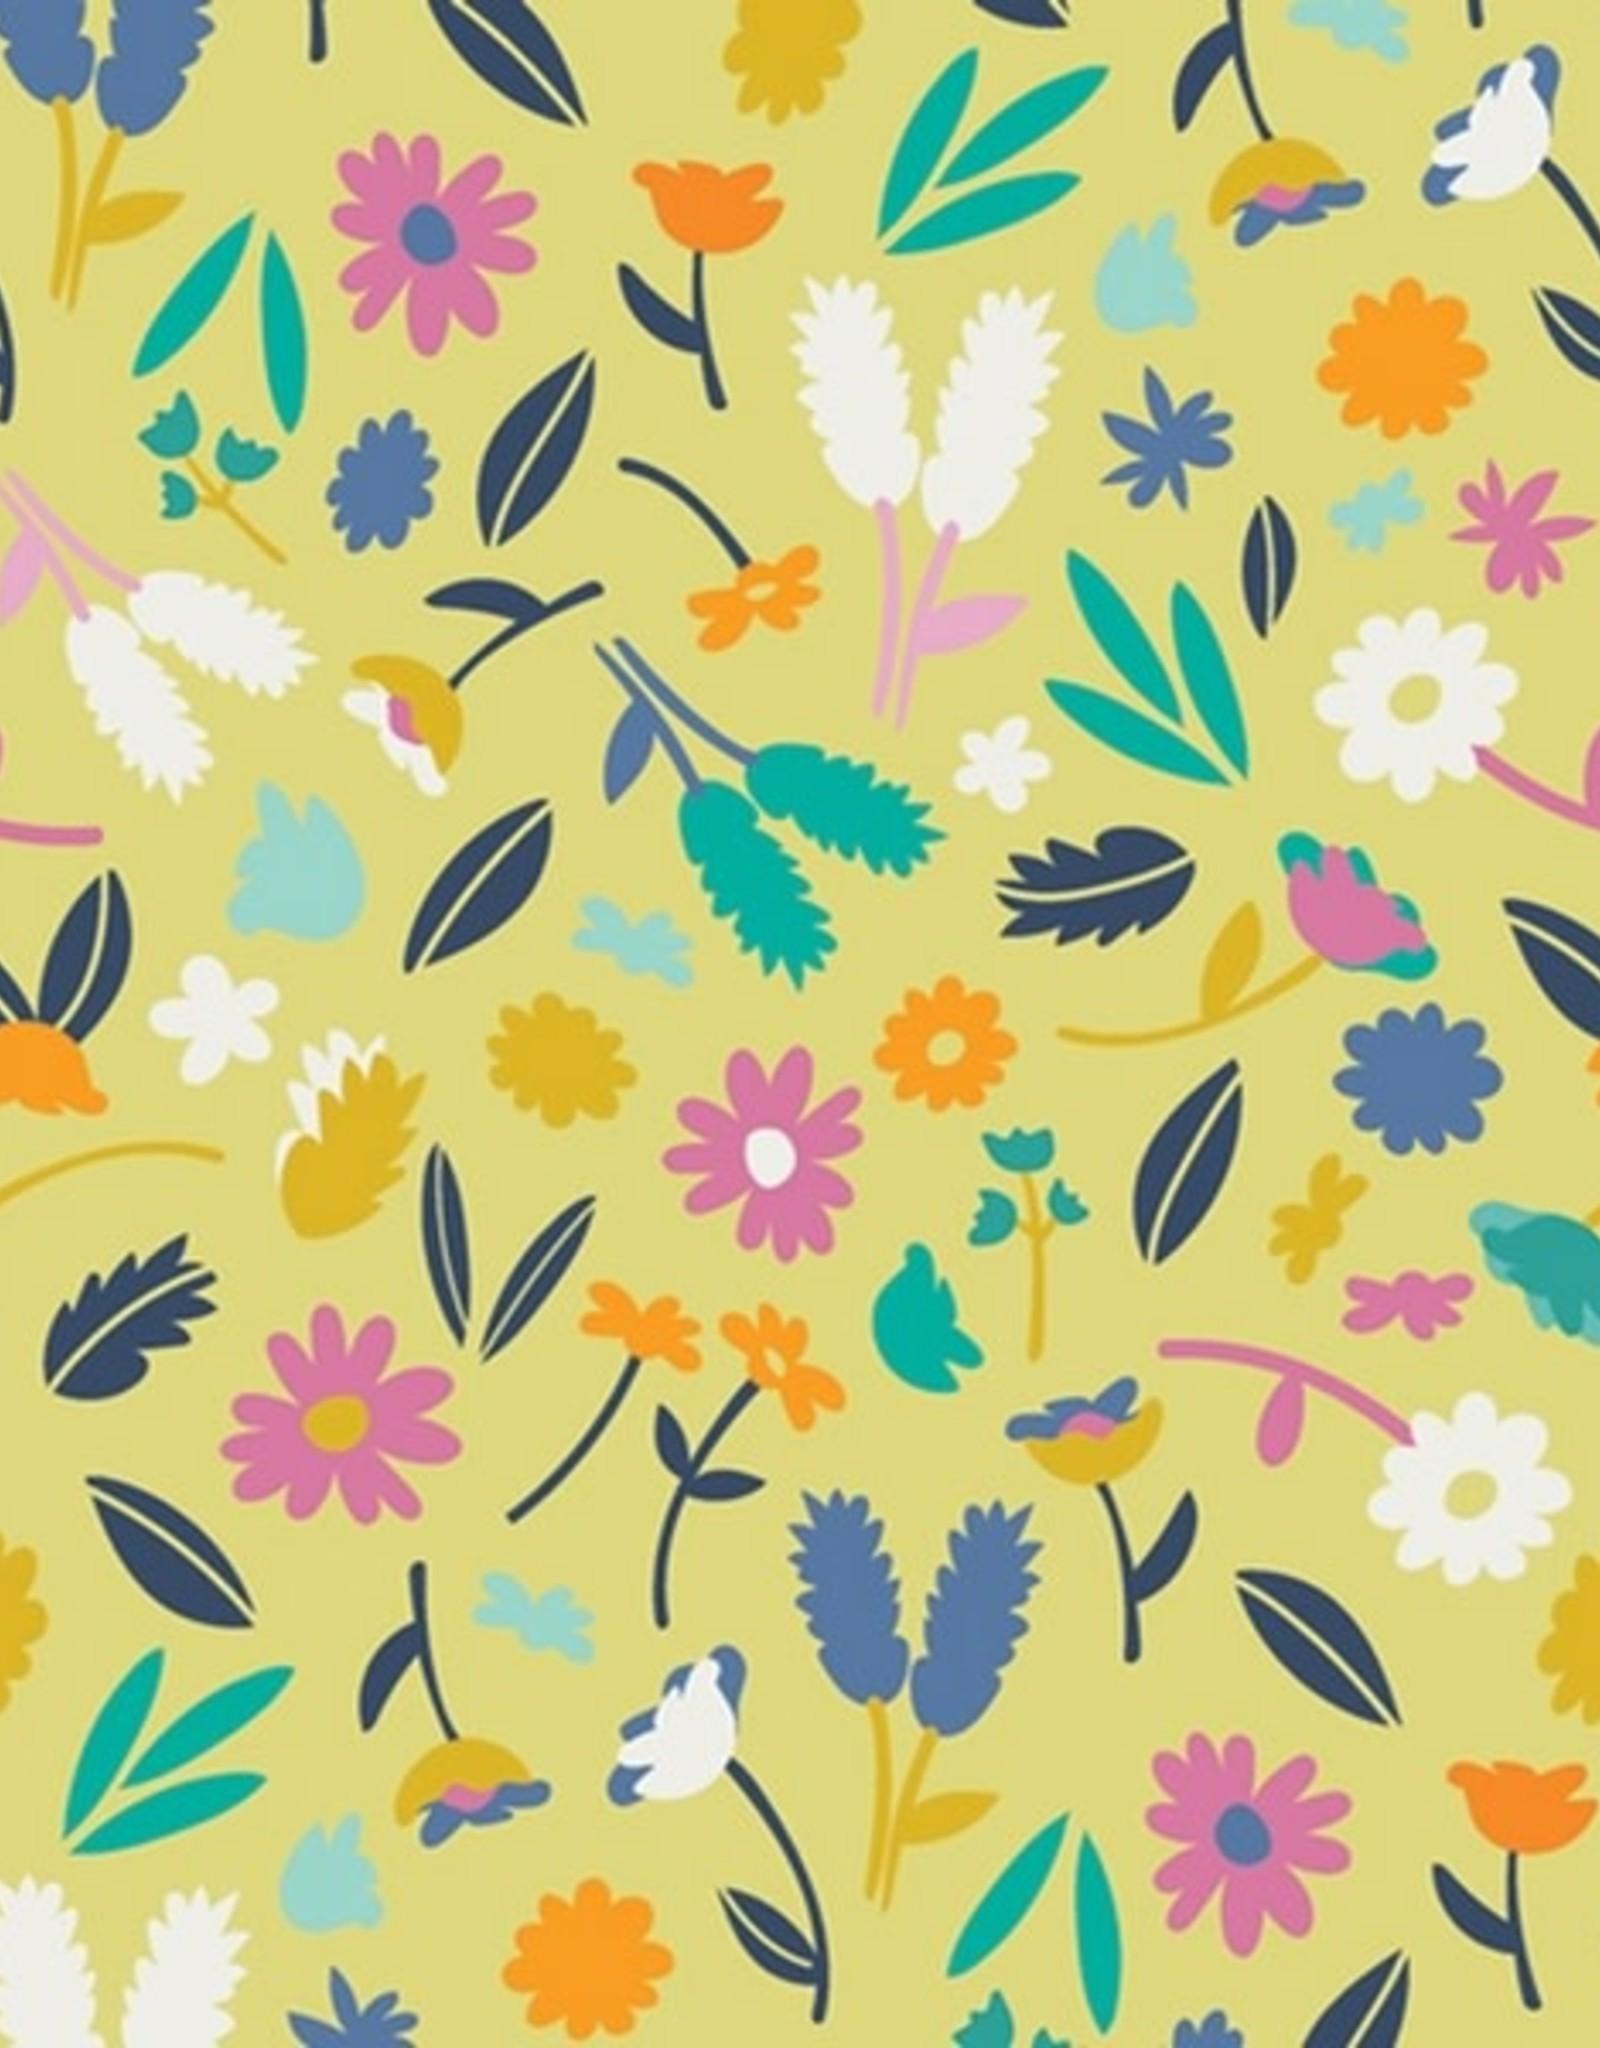 Art Gallery Summer side gele bloemen